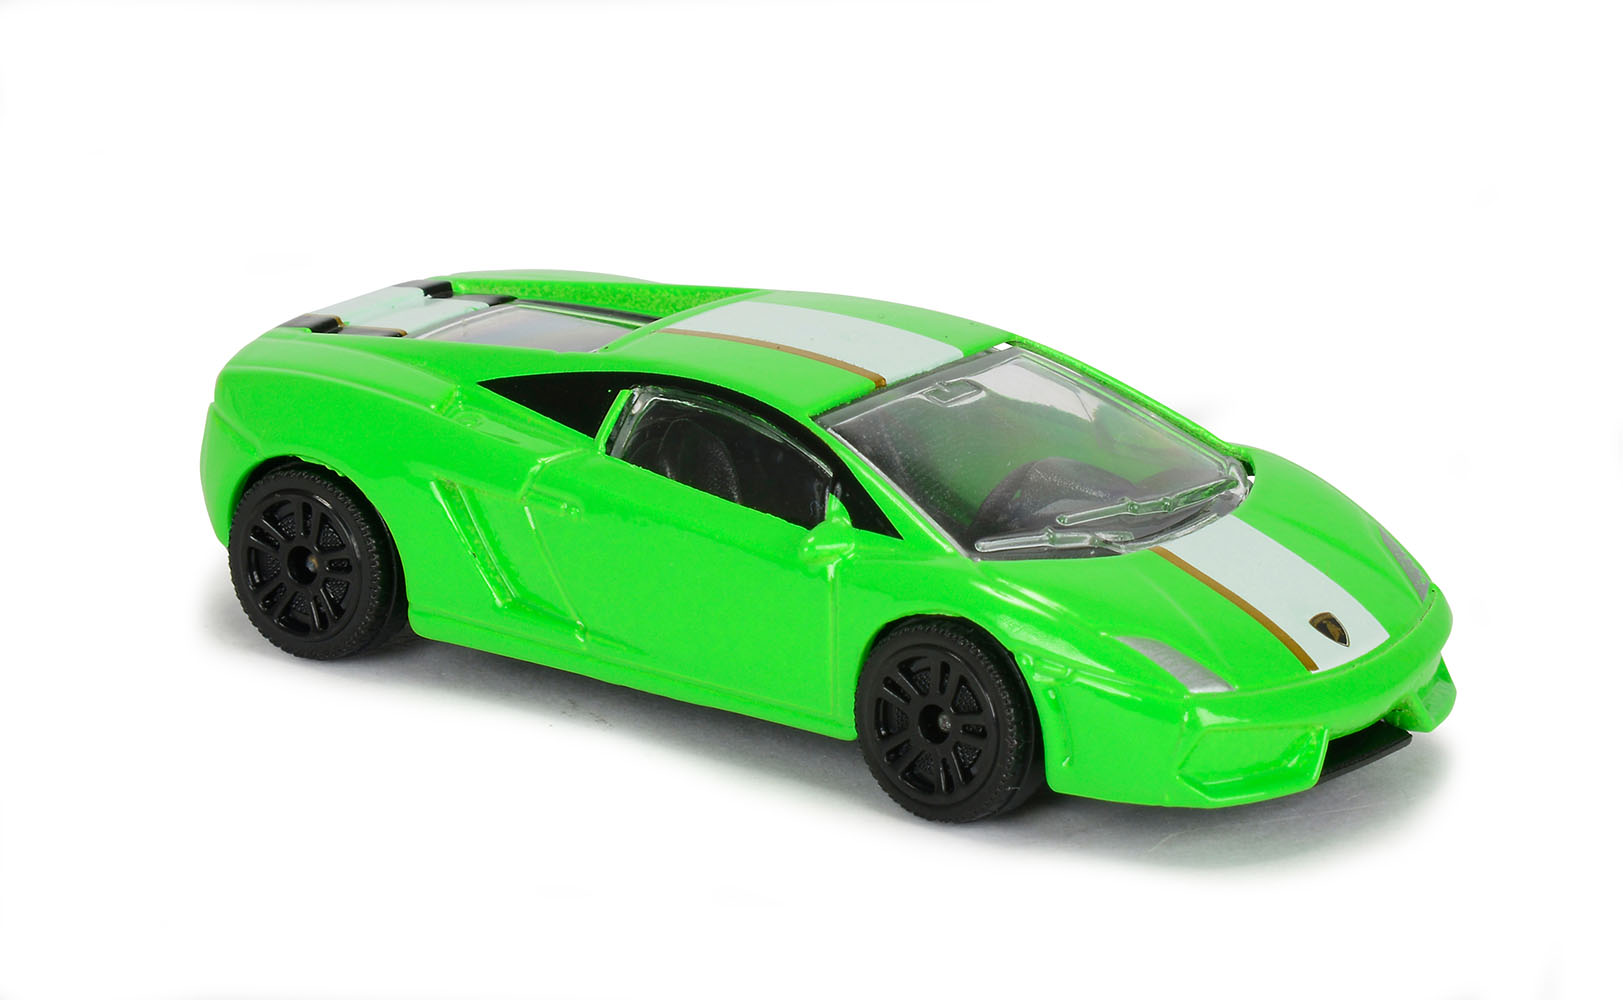 Majorette Creatix Ensemble de course Lamborghini